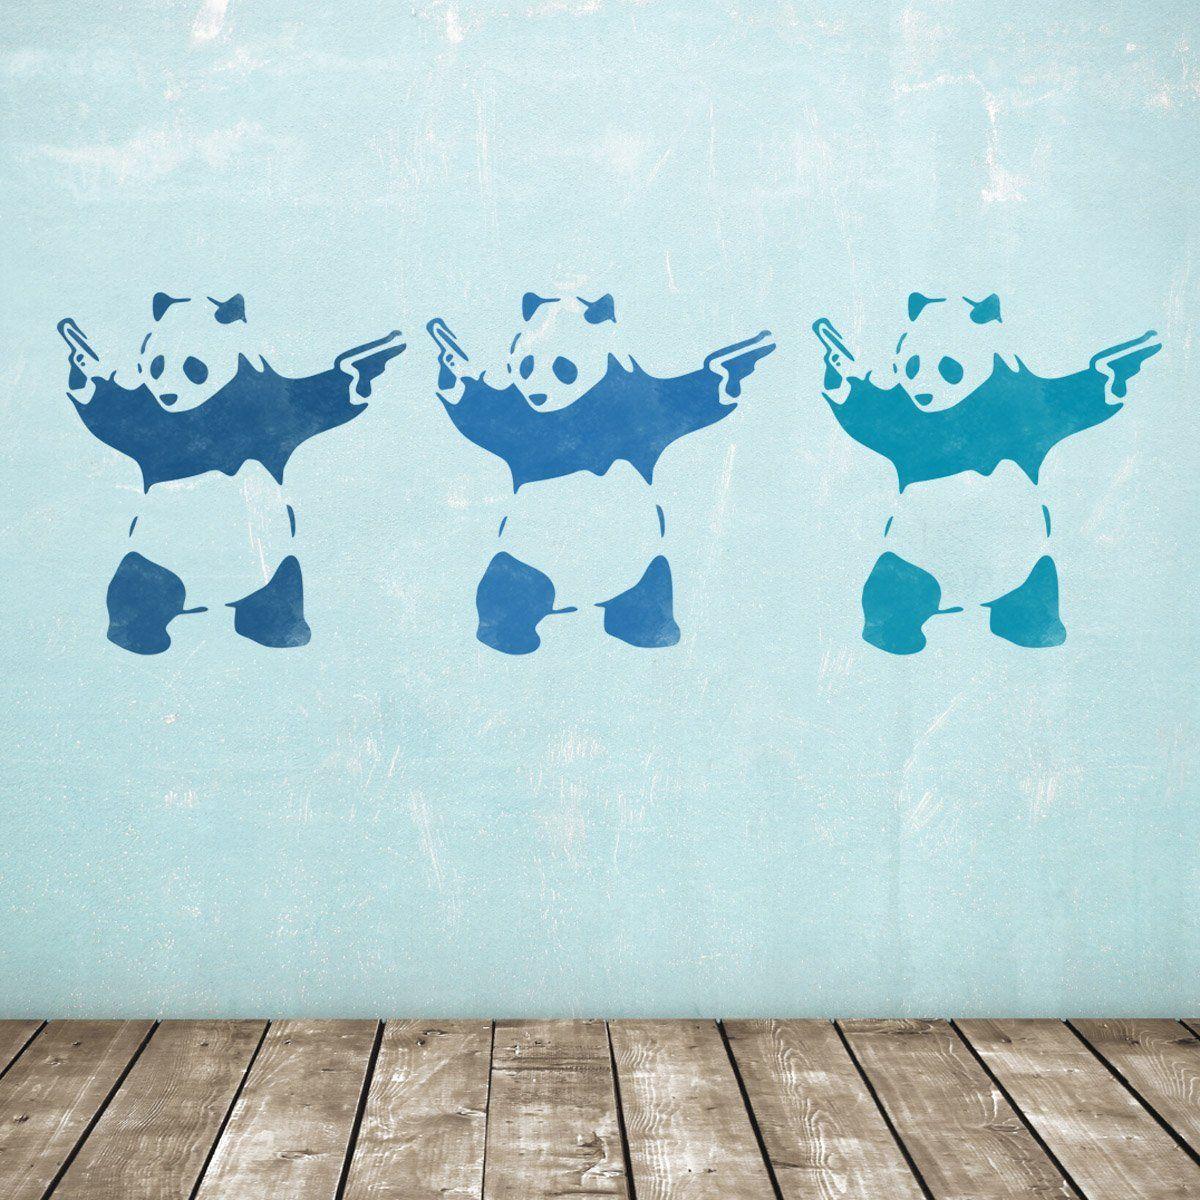 Graffiti art diy - Craftstar Large Banksy Panda Wall Stencil Reusable Mylar Graffiti Art Stencil Amazon Co